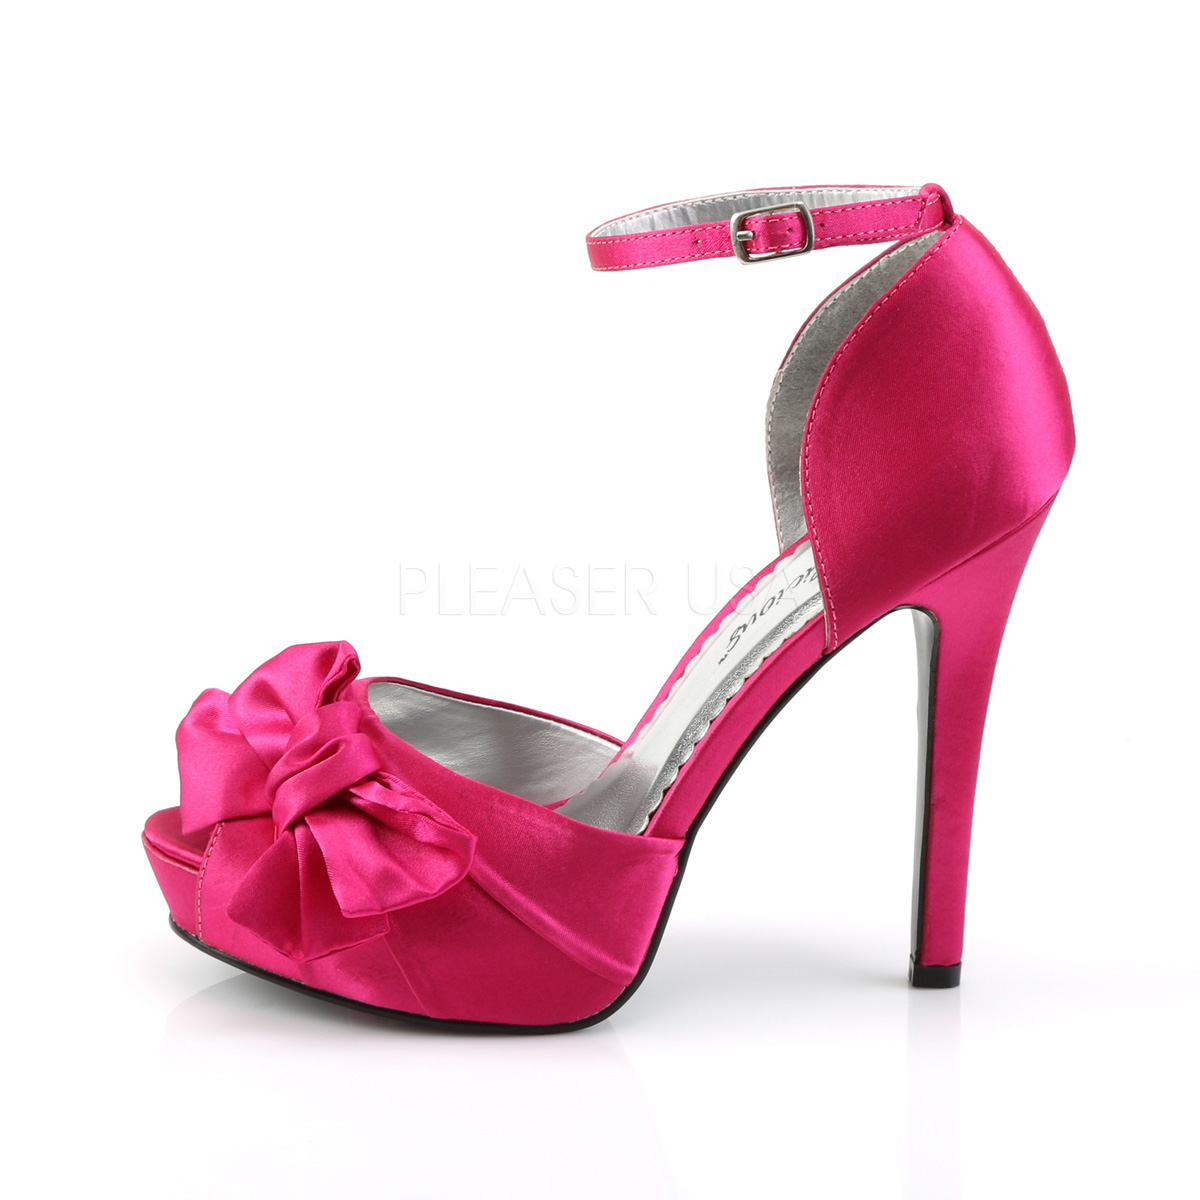 Sandalo, Tronchetti Pleaser LUMINA 36    LUMINA36 HPSA    Spedizione   07e926